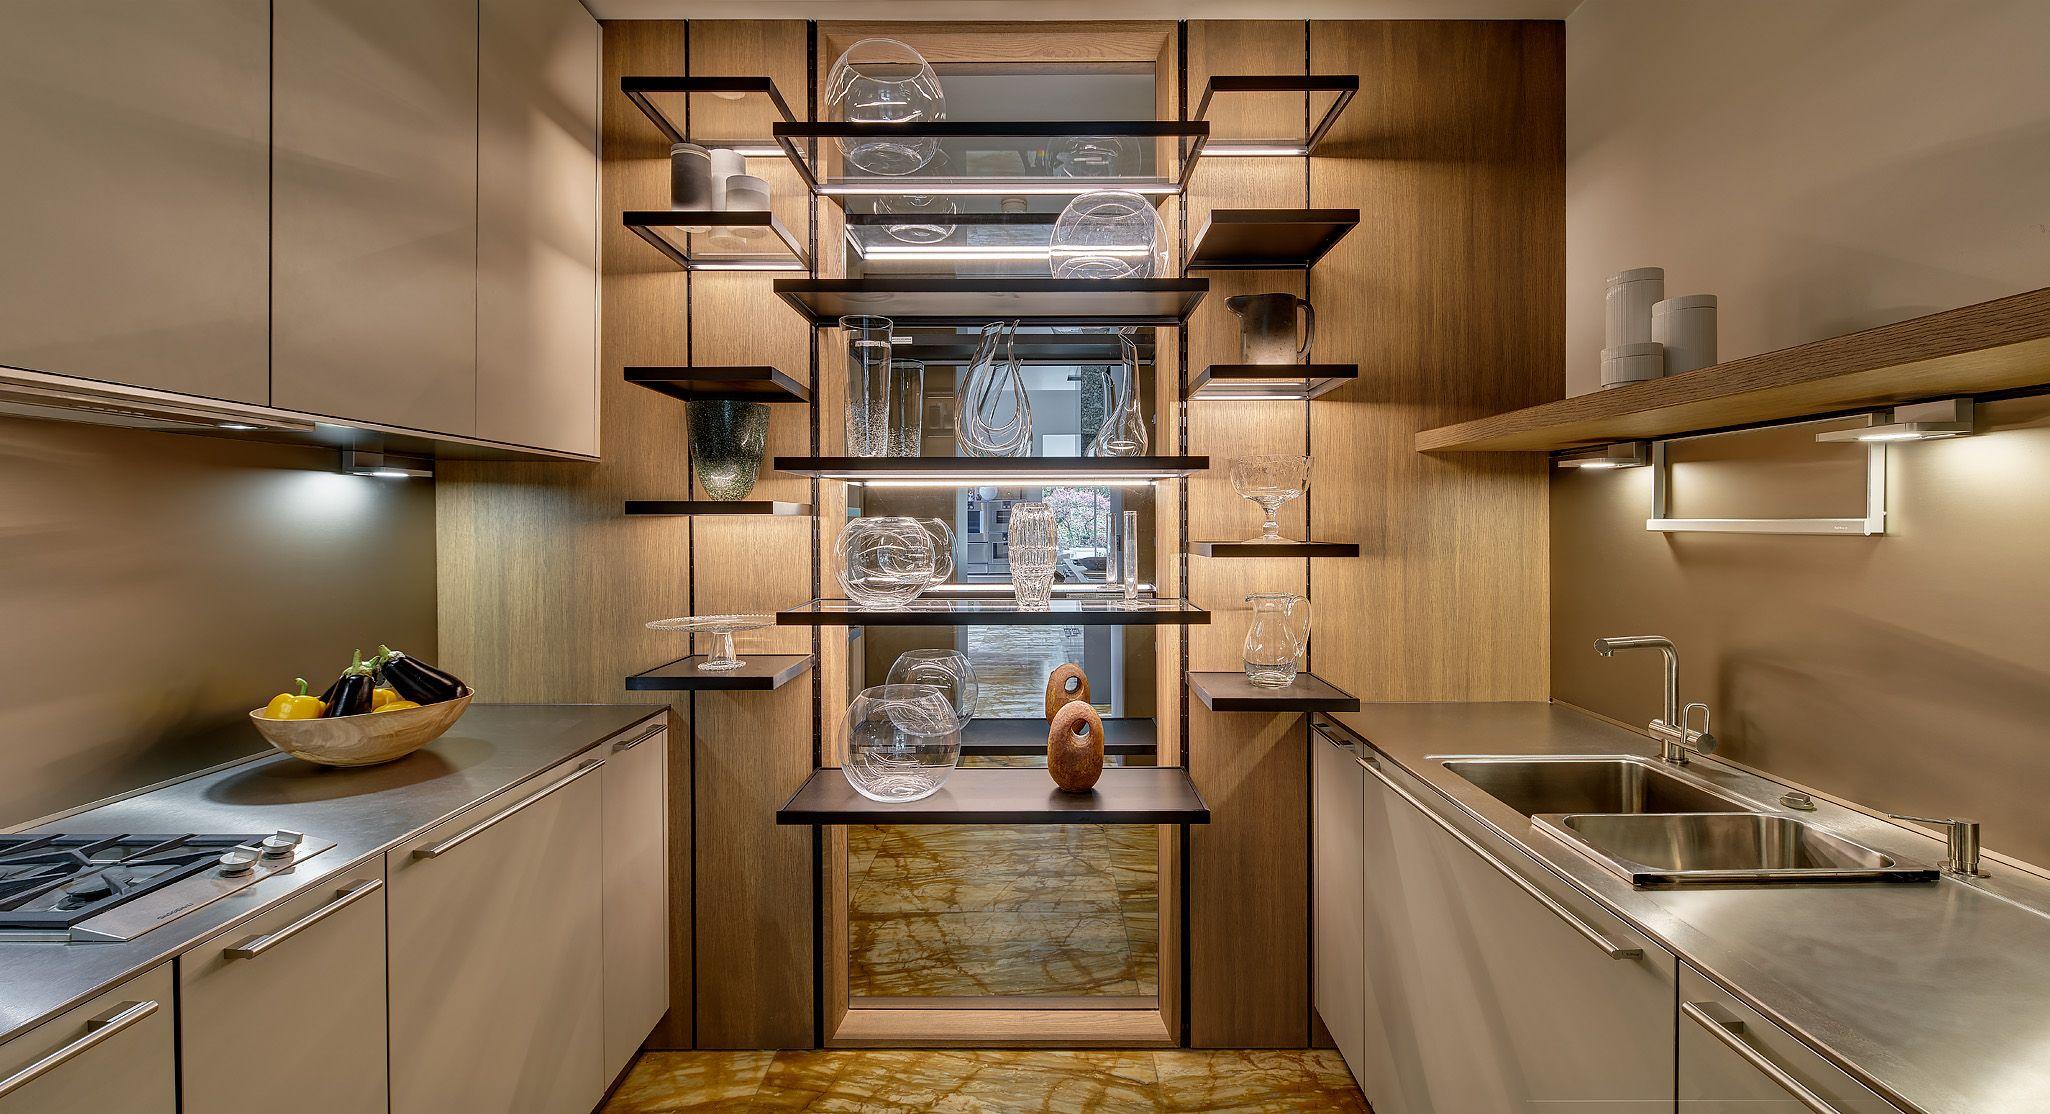 Bulthaup B3 Kitchen Featuring Melamine Resin Monobloc Island Wall Hung Gaggenau Ovens Sienna Marble Sand Beige Aluminium P Kitchen Kitchen Cabinets Gaggenau